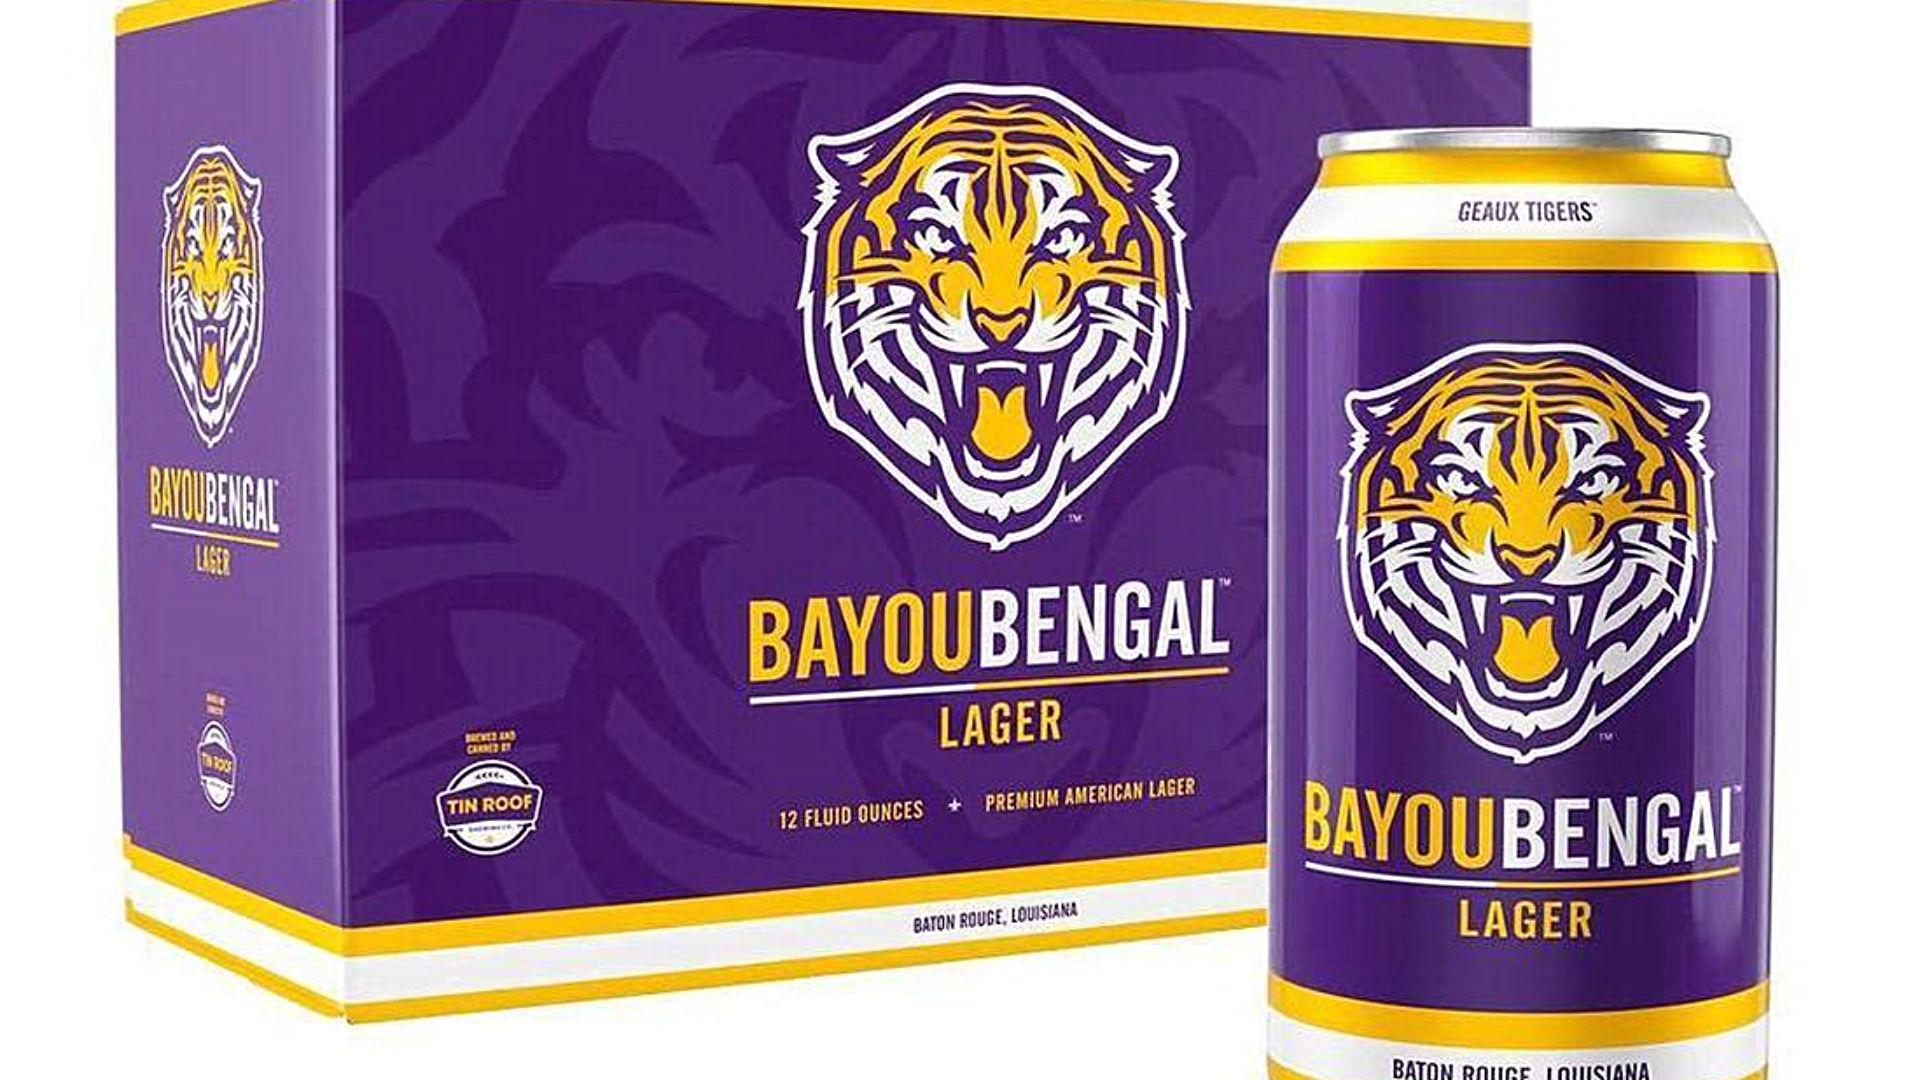 Bayou-bengal-lsu-72116-usnews-twitter-ftr_w4jnr26a0ddm1hq0fiuz68020